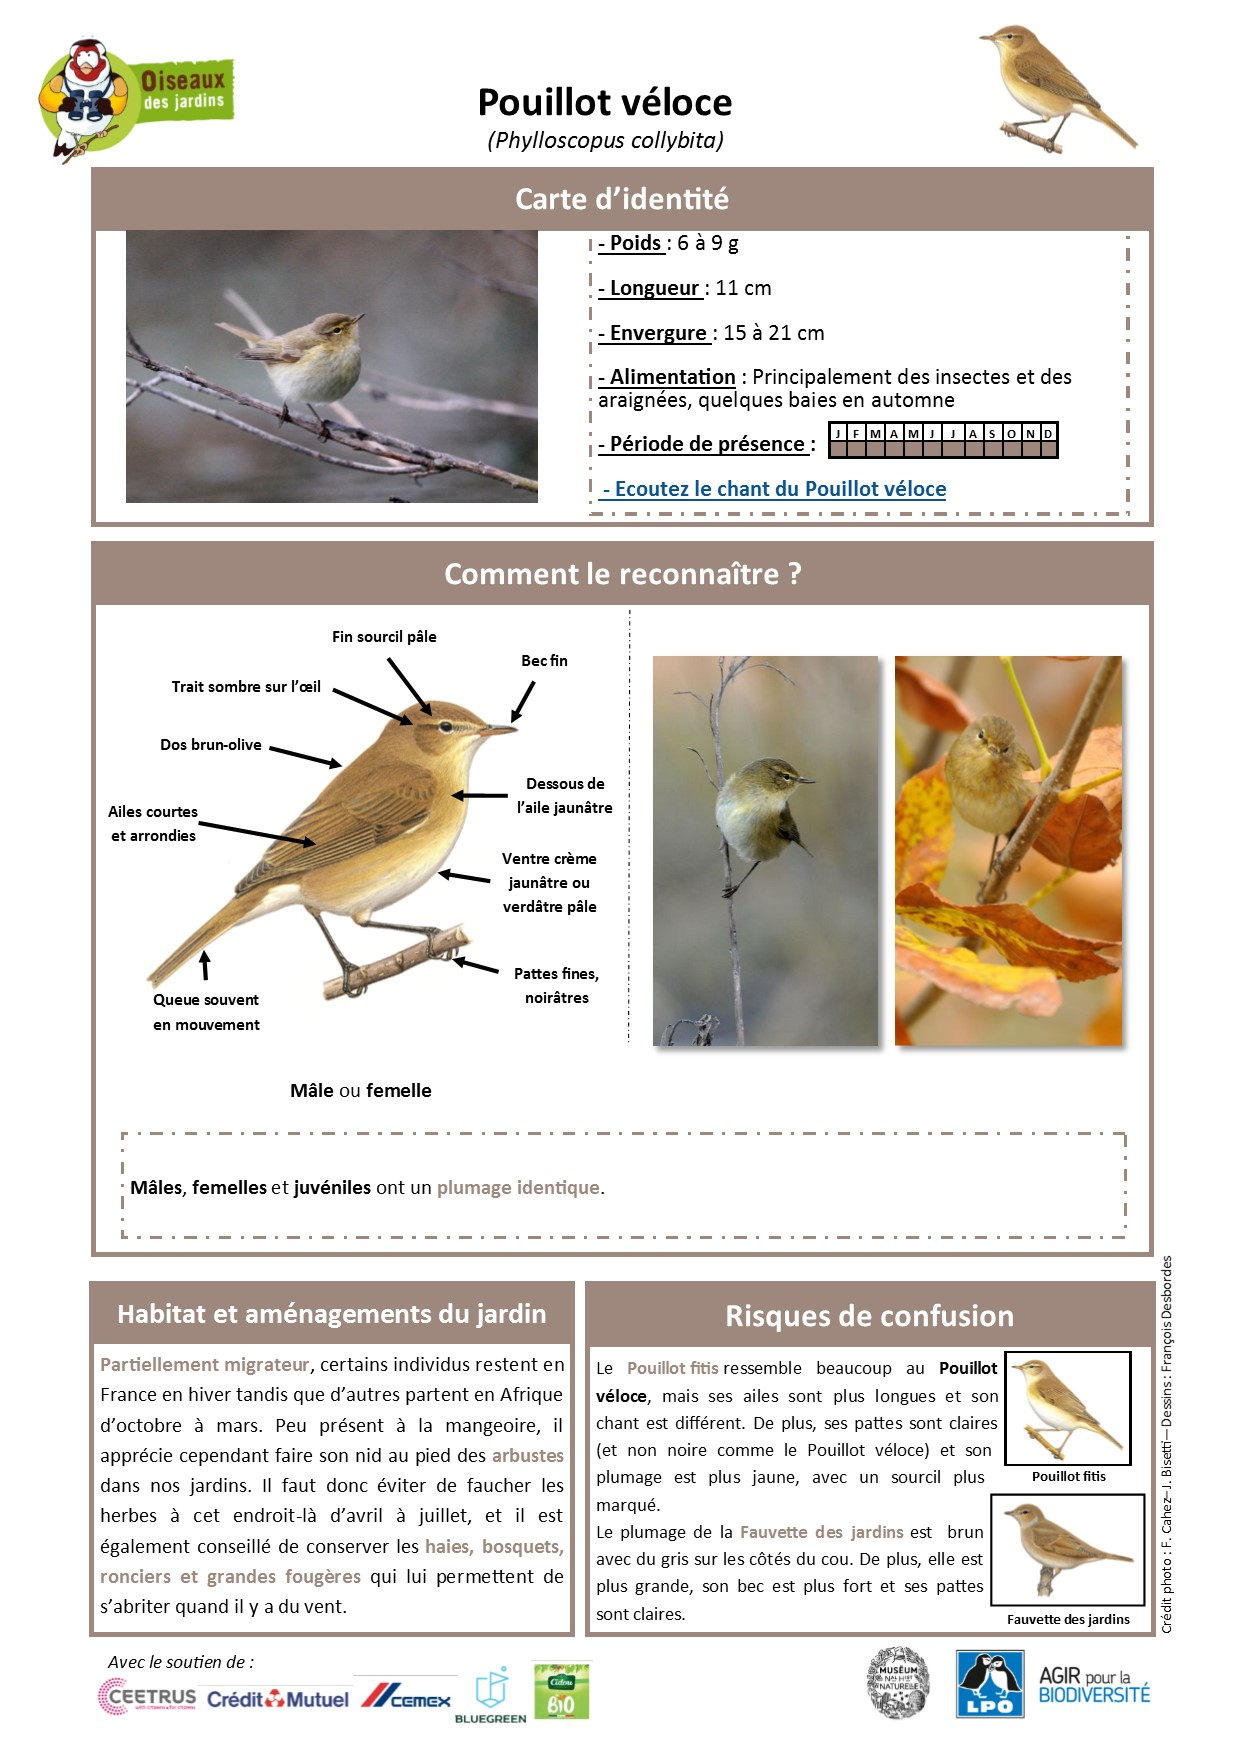 https://cdnfiles2.biolovision.net/www.oiseauxdesjardins.fr/userfiles/Fichesespces/FicheespcePVEL.jpg